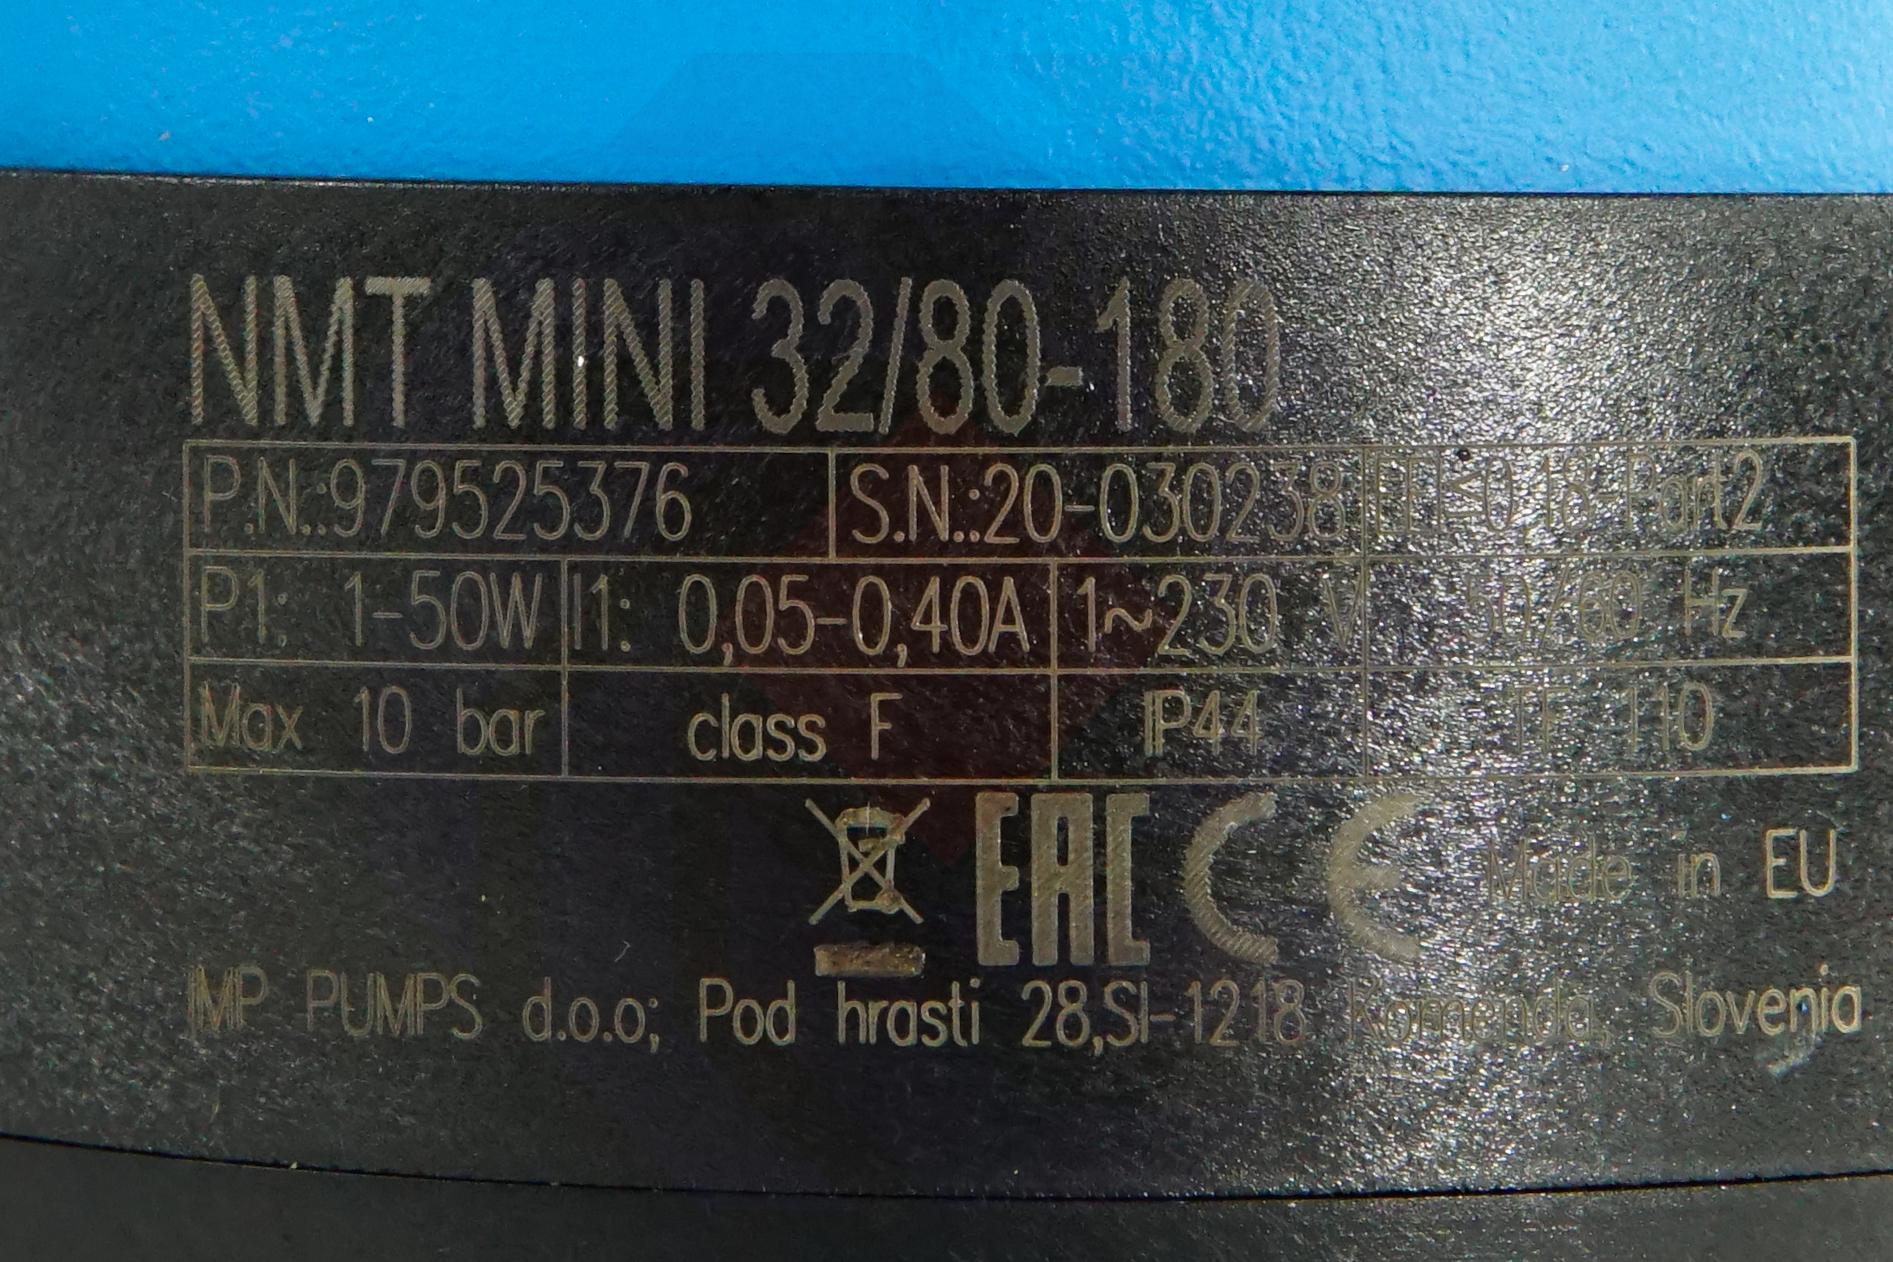 Насос циркуляционный IMP NMT MINI 32/80-180